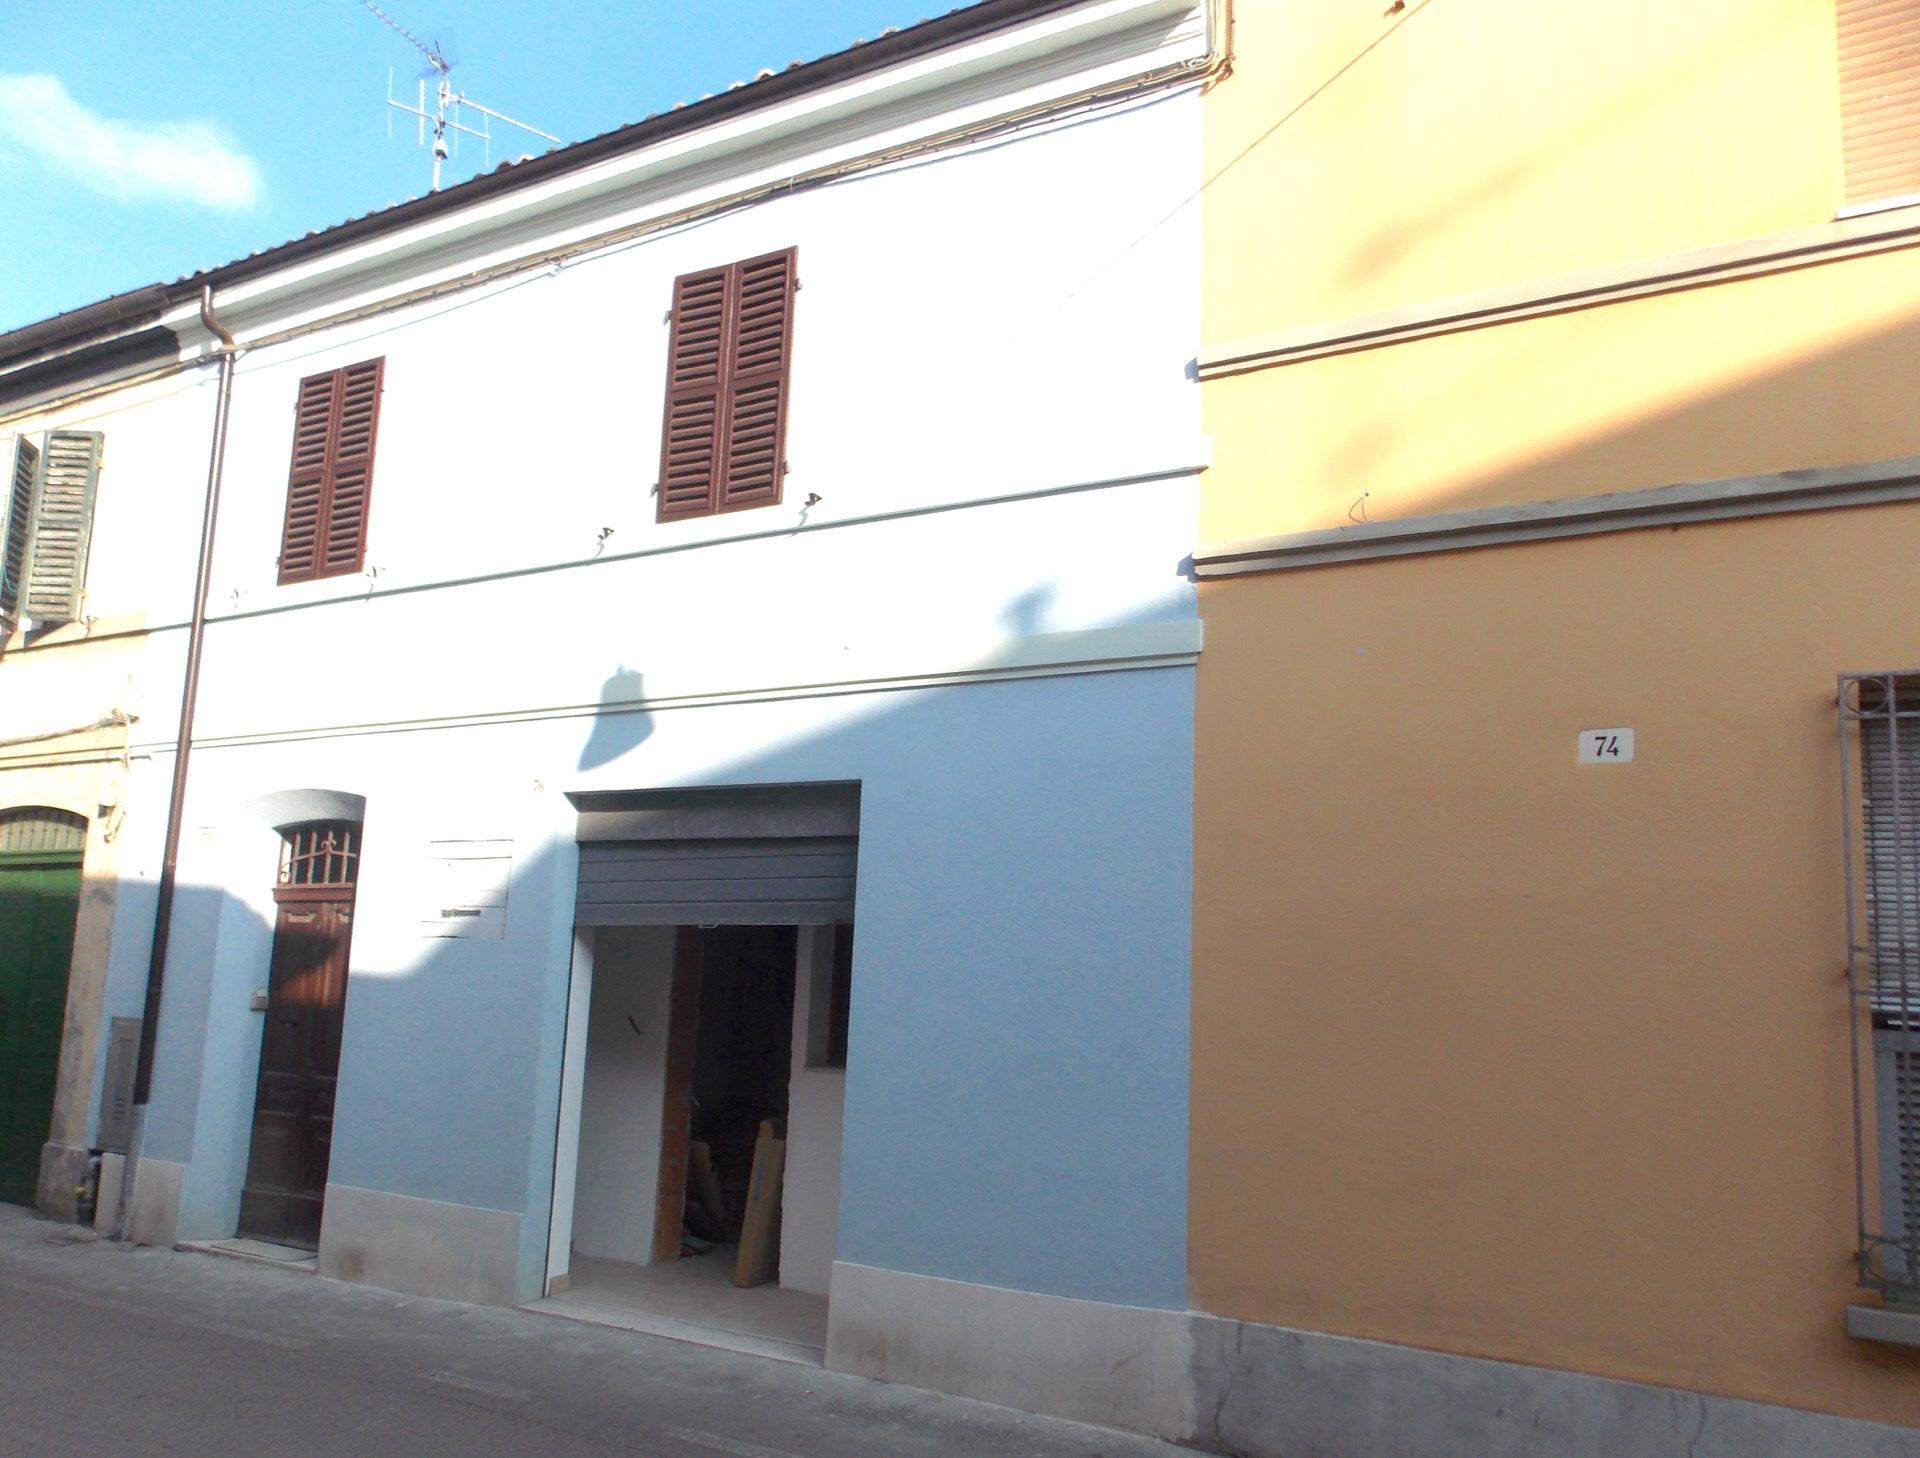 Appartamento, 83 Mq, Vendita - Forlì (Forlì - Cesena)